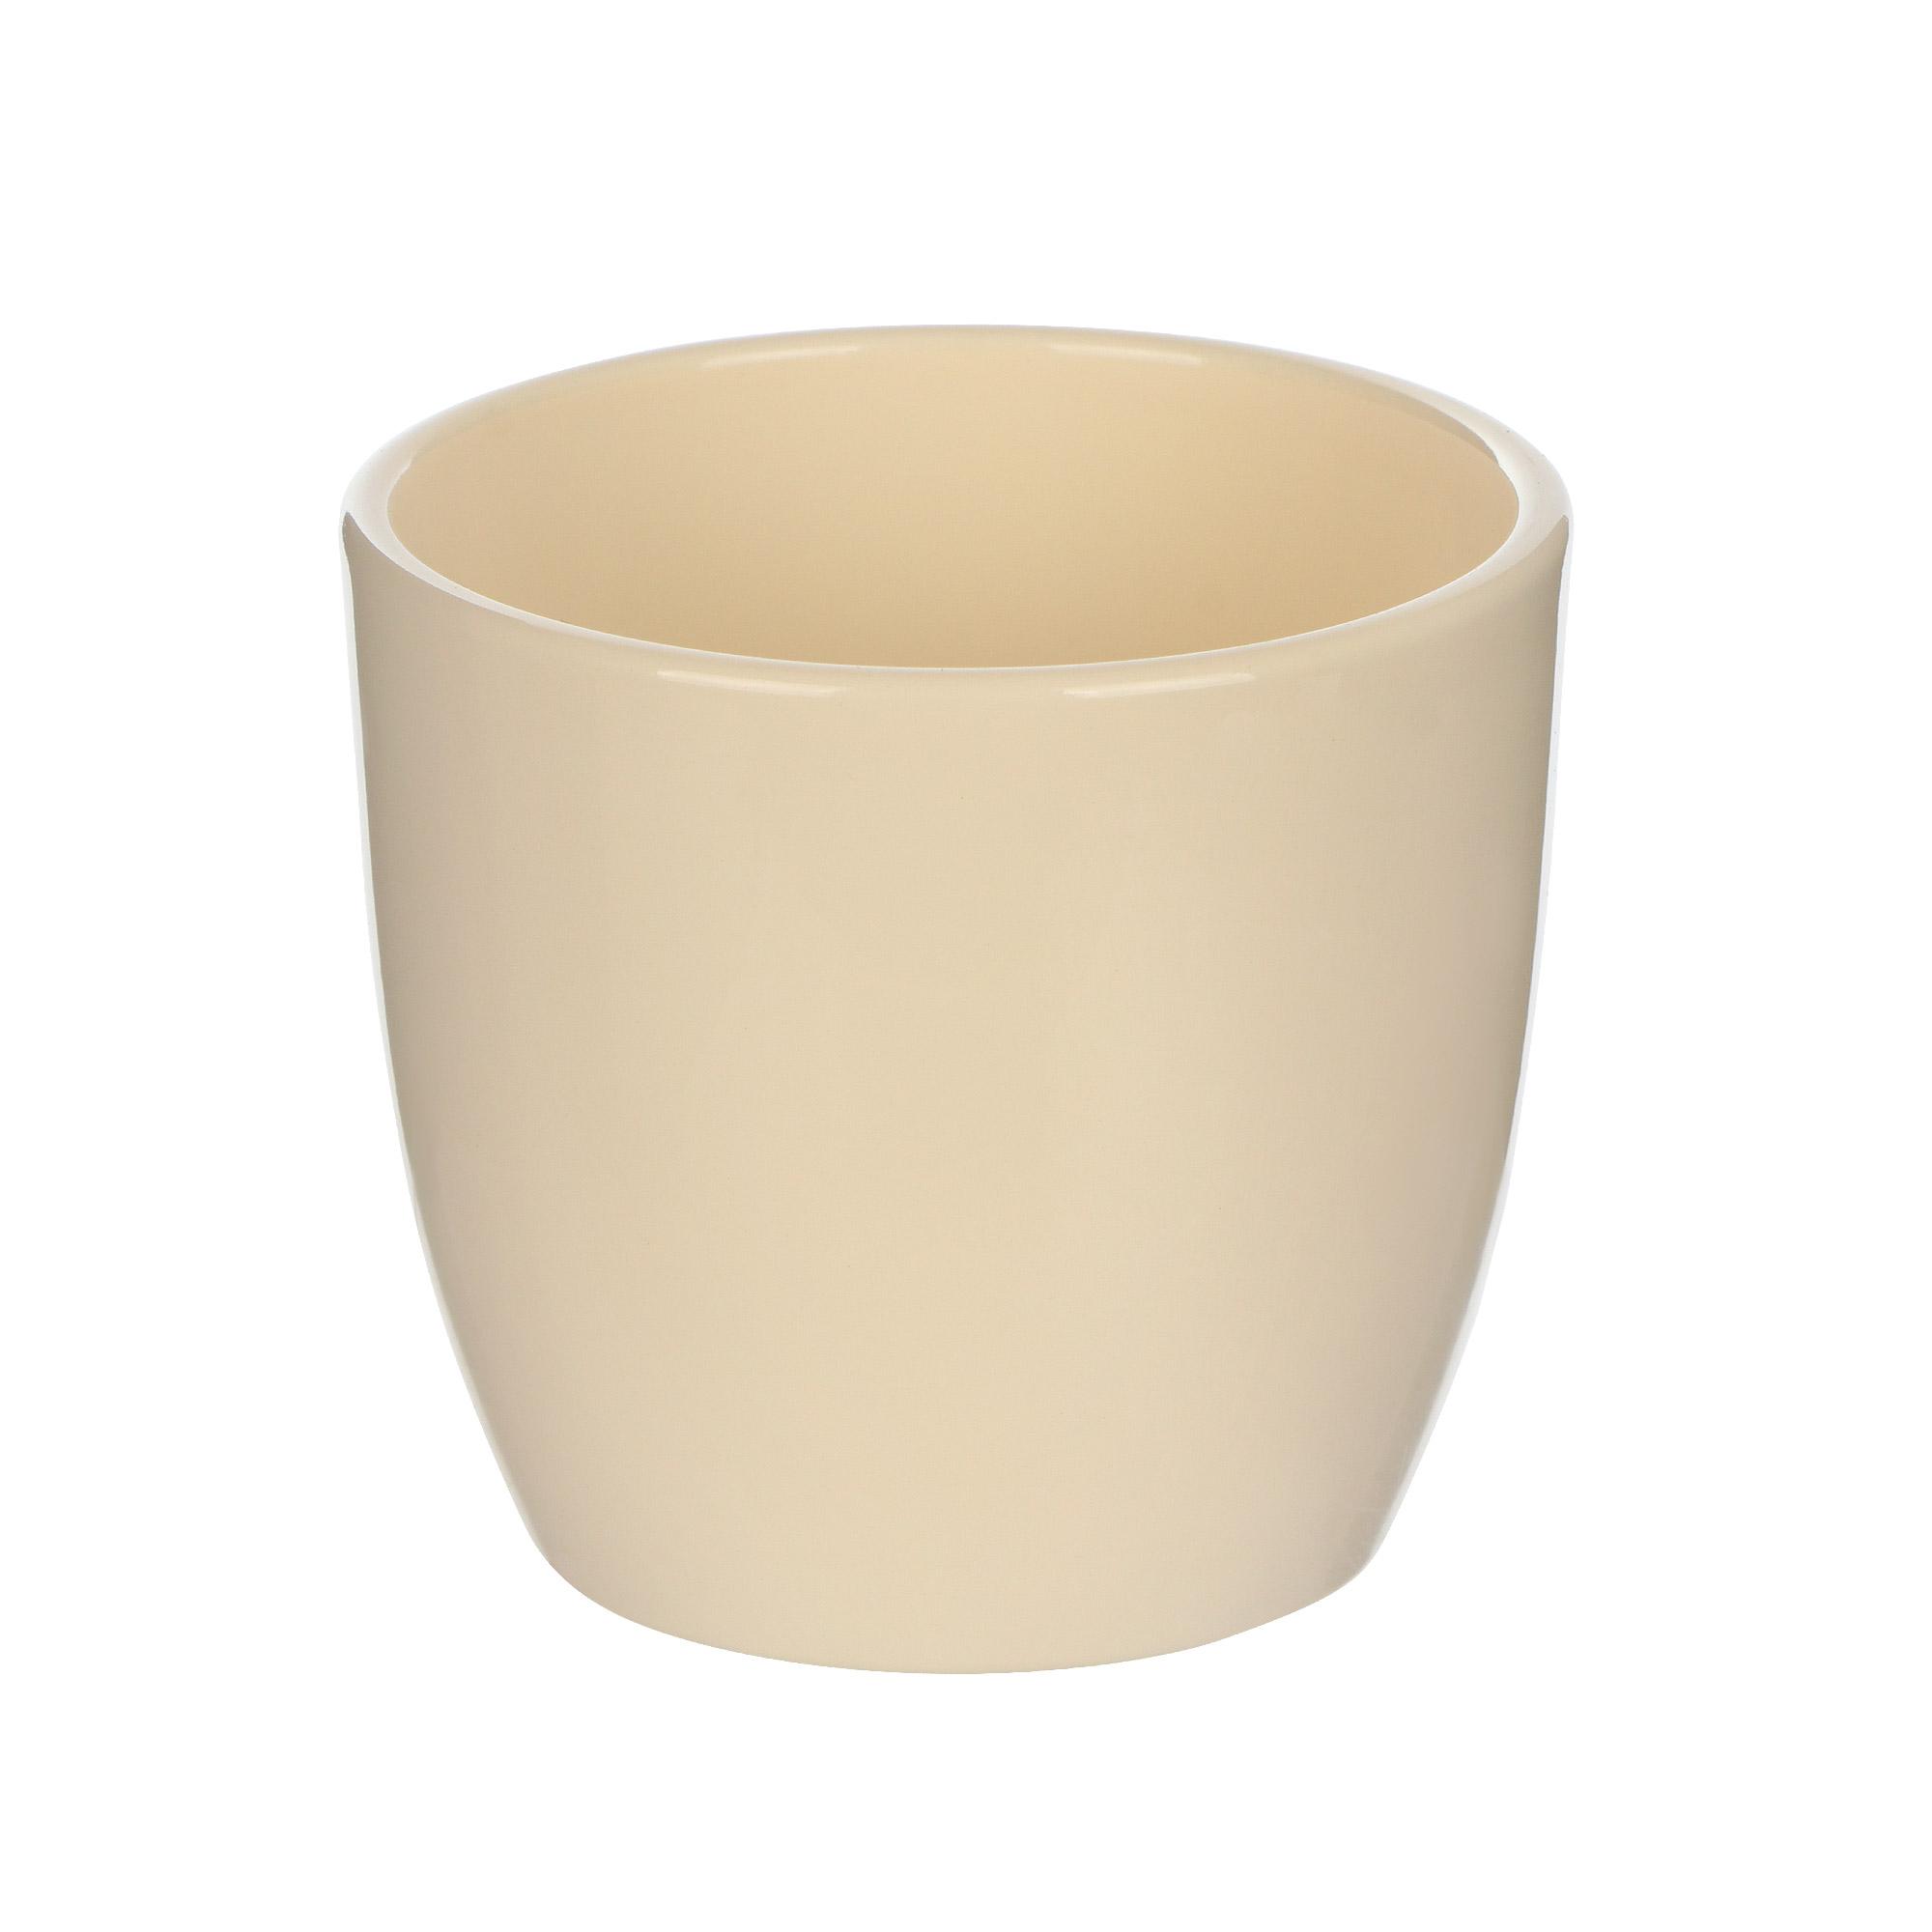 Кашпо Soendgen basel d08 глянцевый ваниль недорого